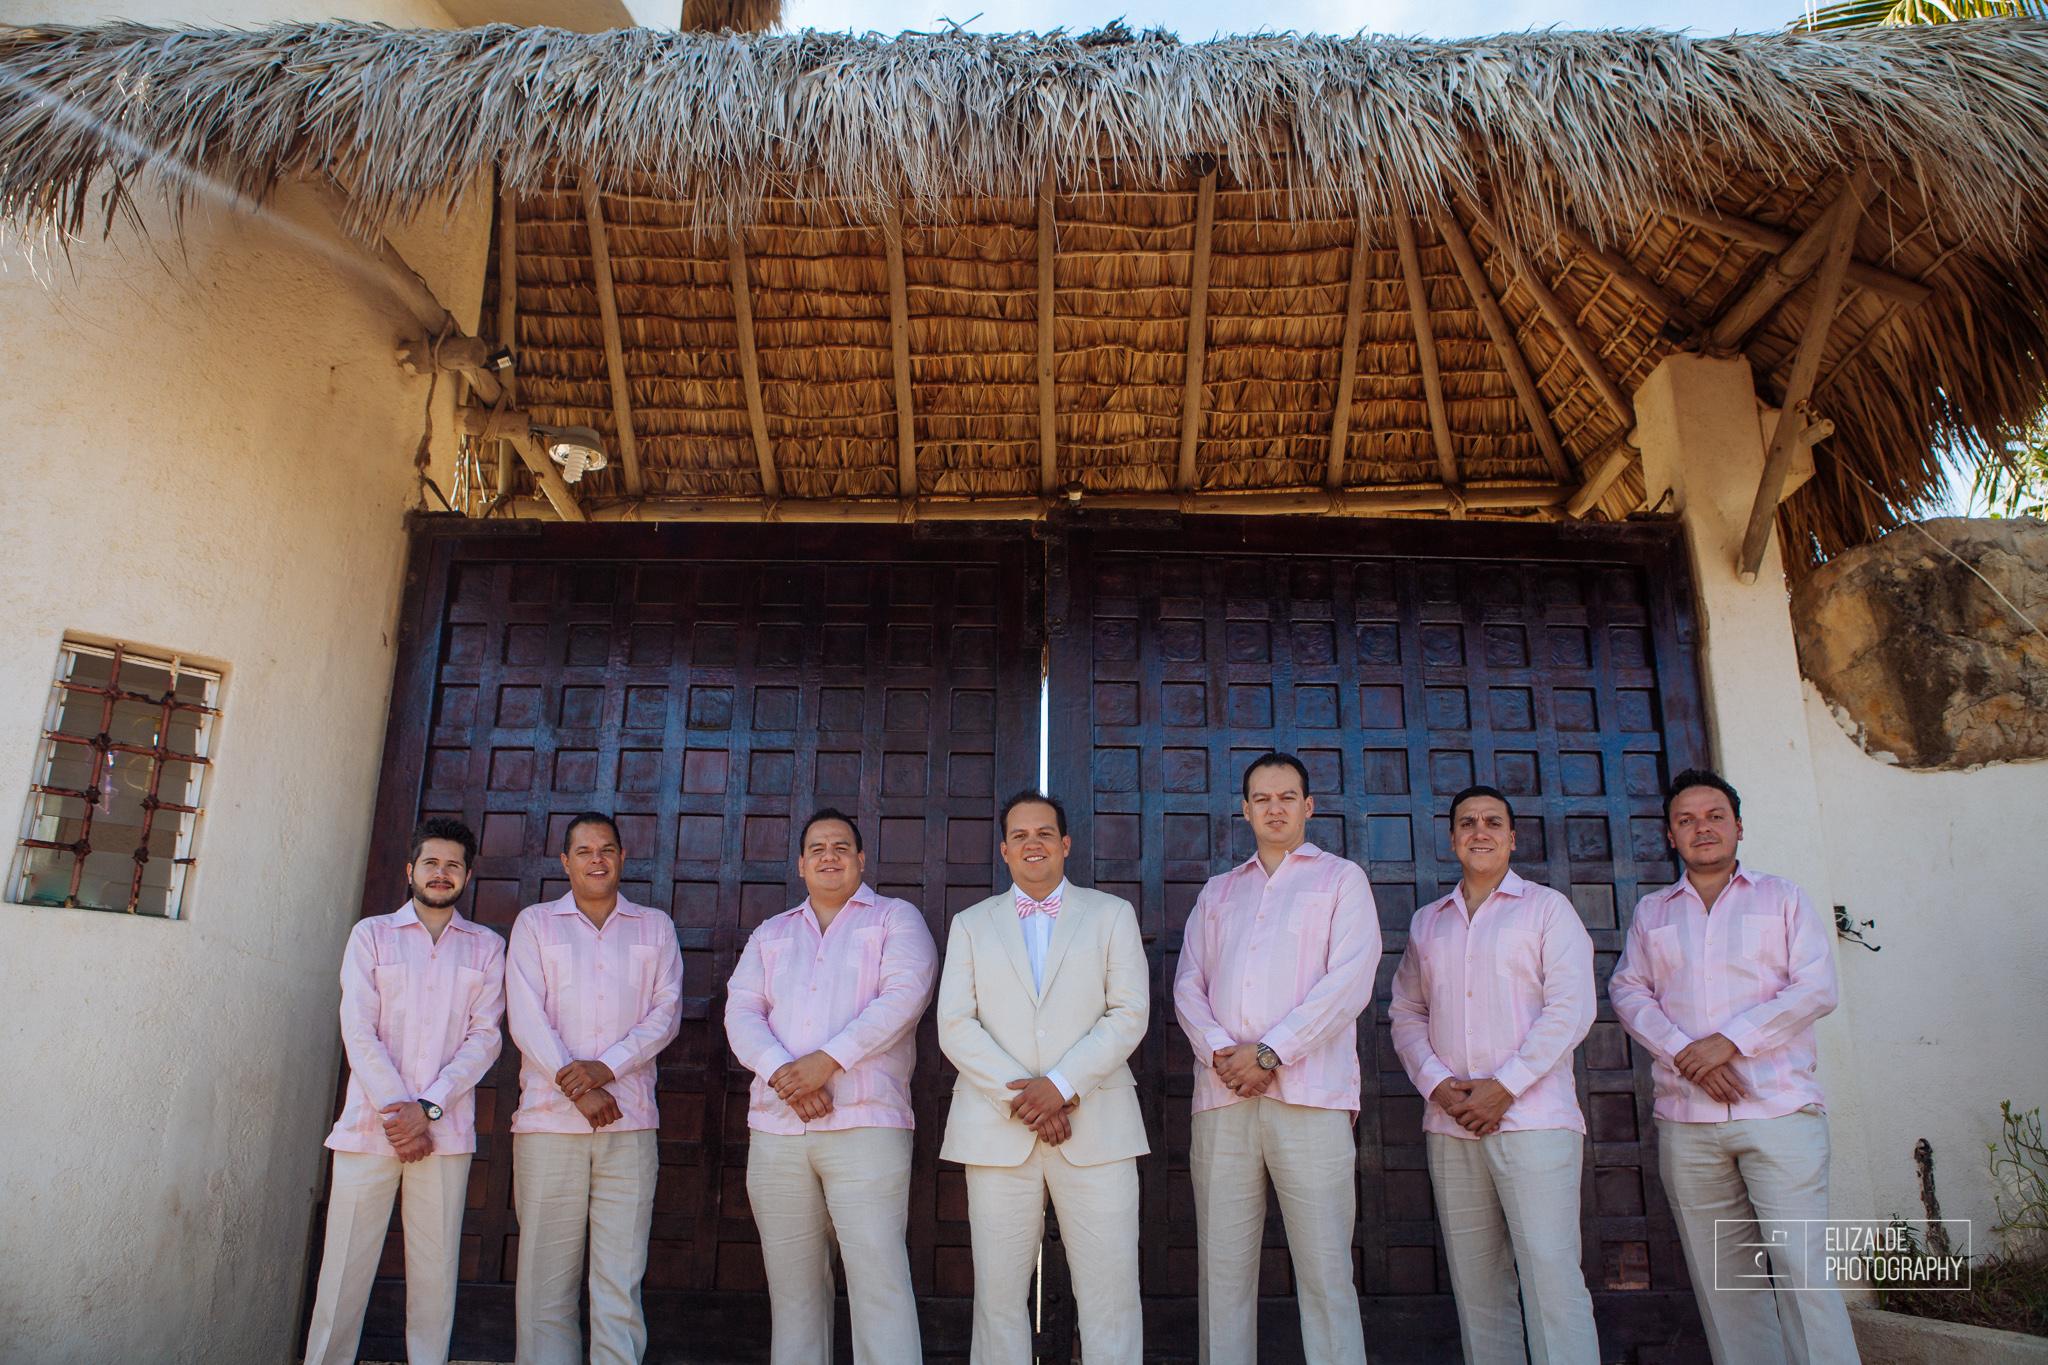 Pay and Ferran_Acapulco_Destination Wedding_Elizalde Photography-42.jpg